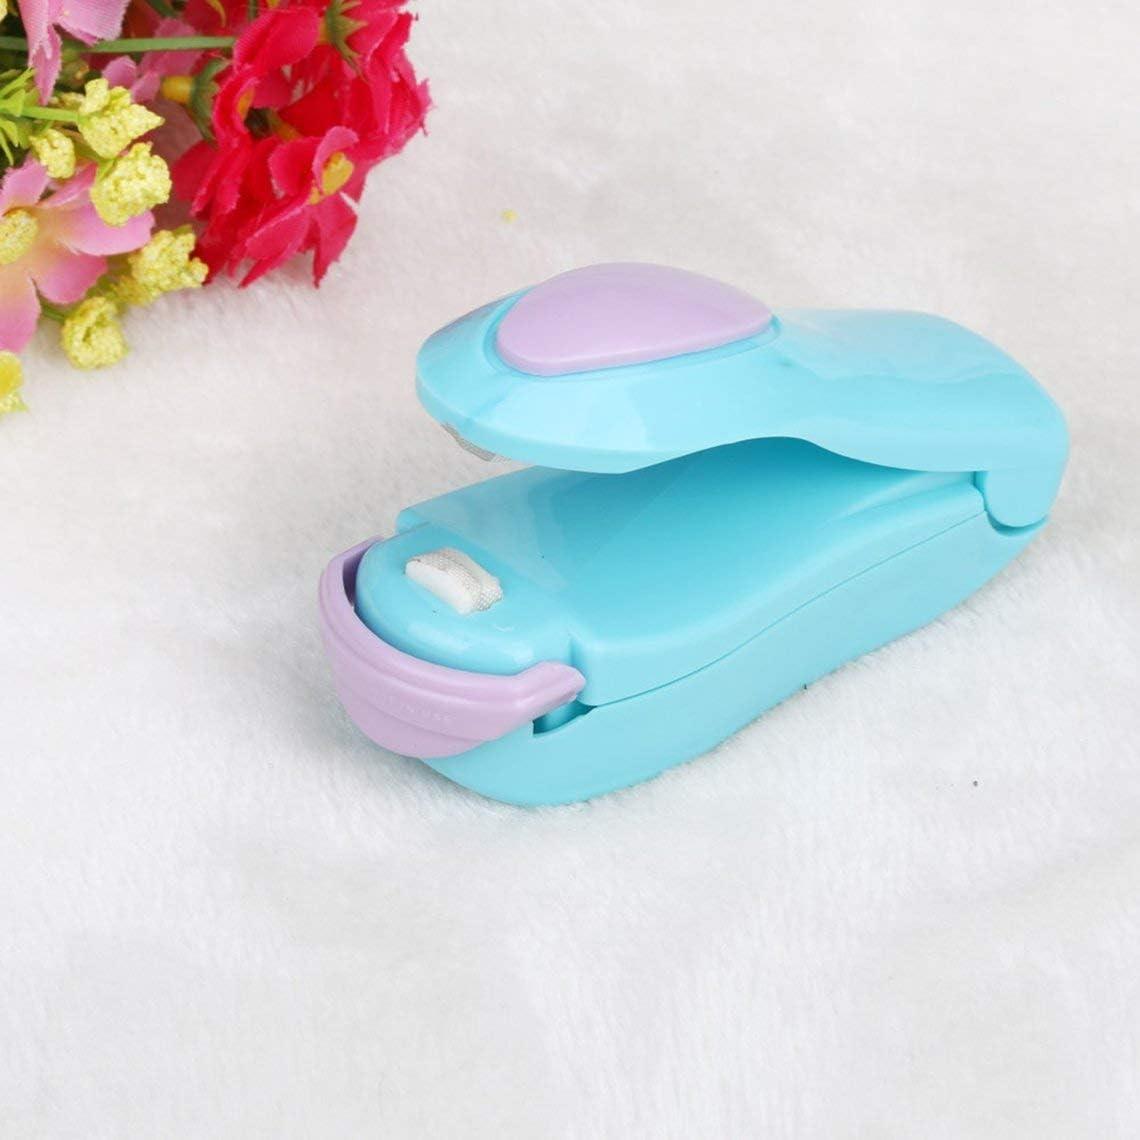 Home Creative Fashion Mini Portable Heat Sealing Machine Impulse Sealer Seal Packing Plastic Bag Sealing Machine